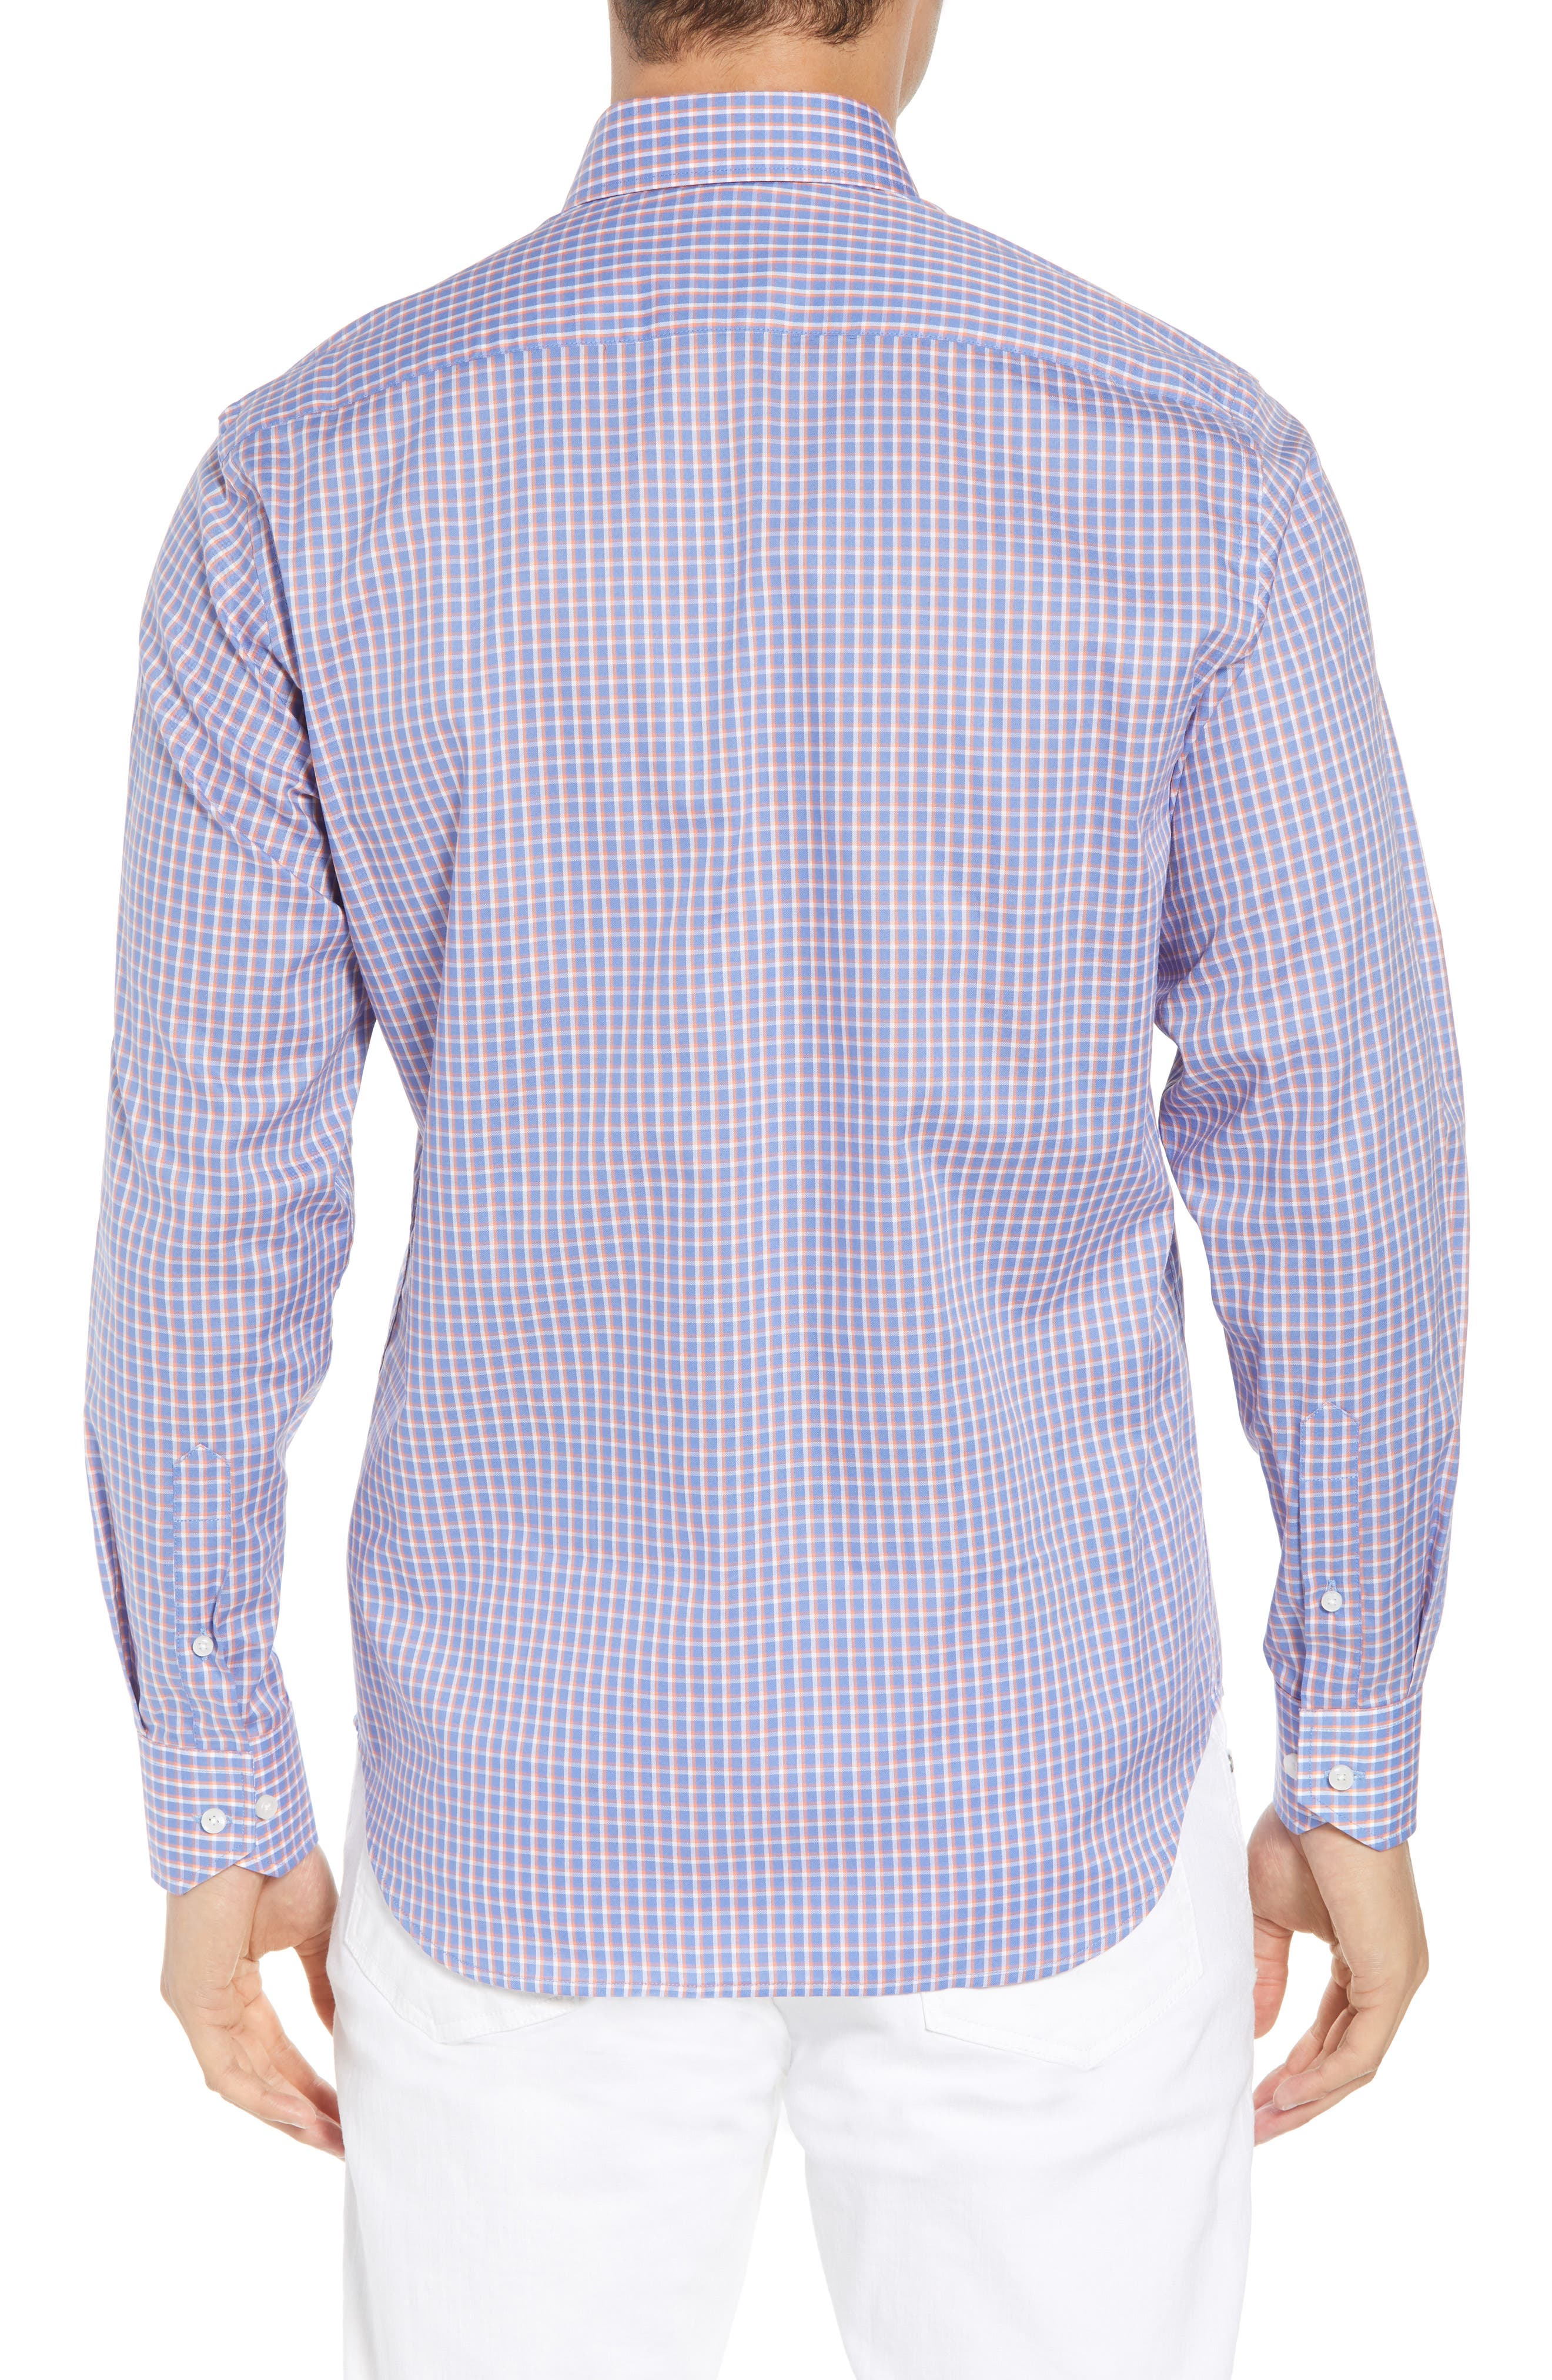 Bader Regular Fit Check Sport Shirt,                             Alternate thumbnail 3, color,                             Navy